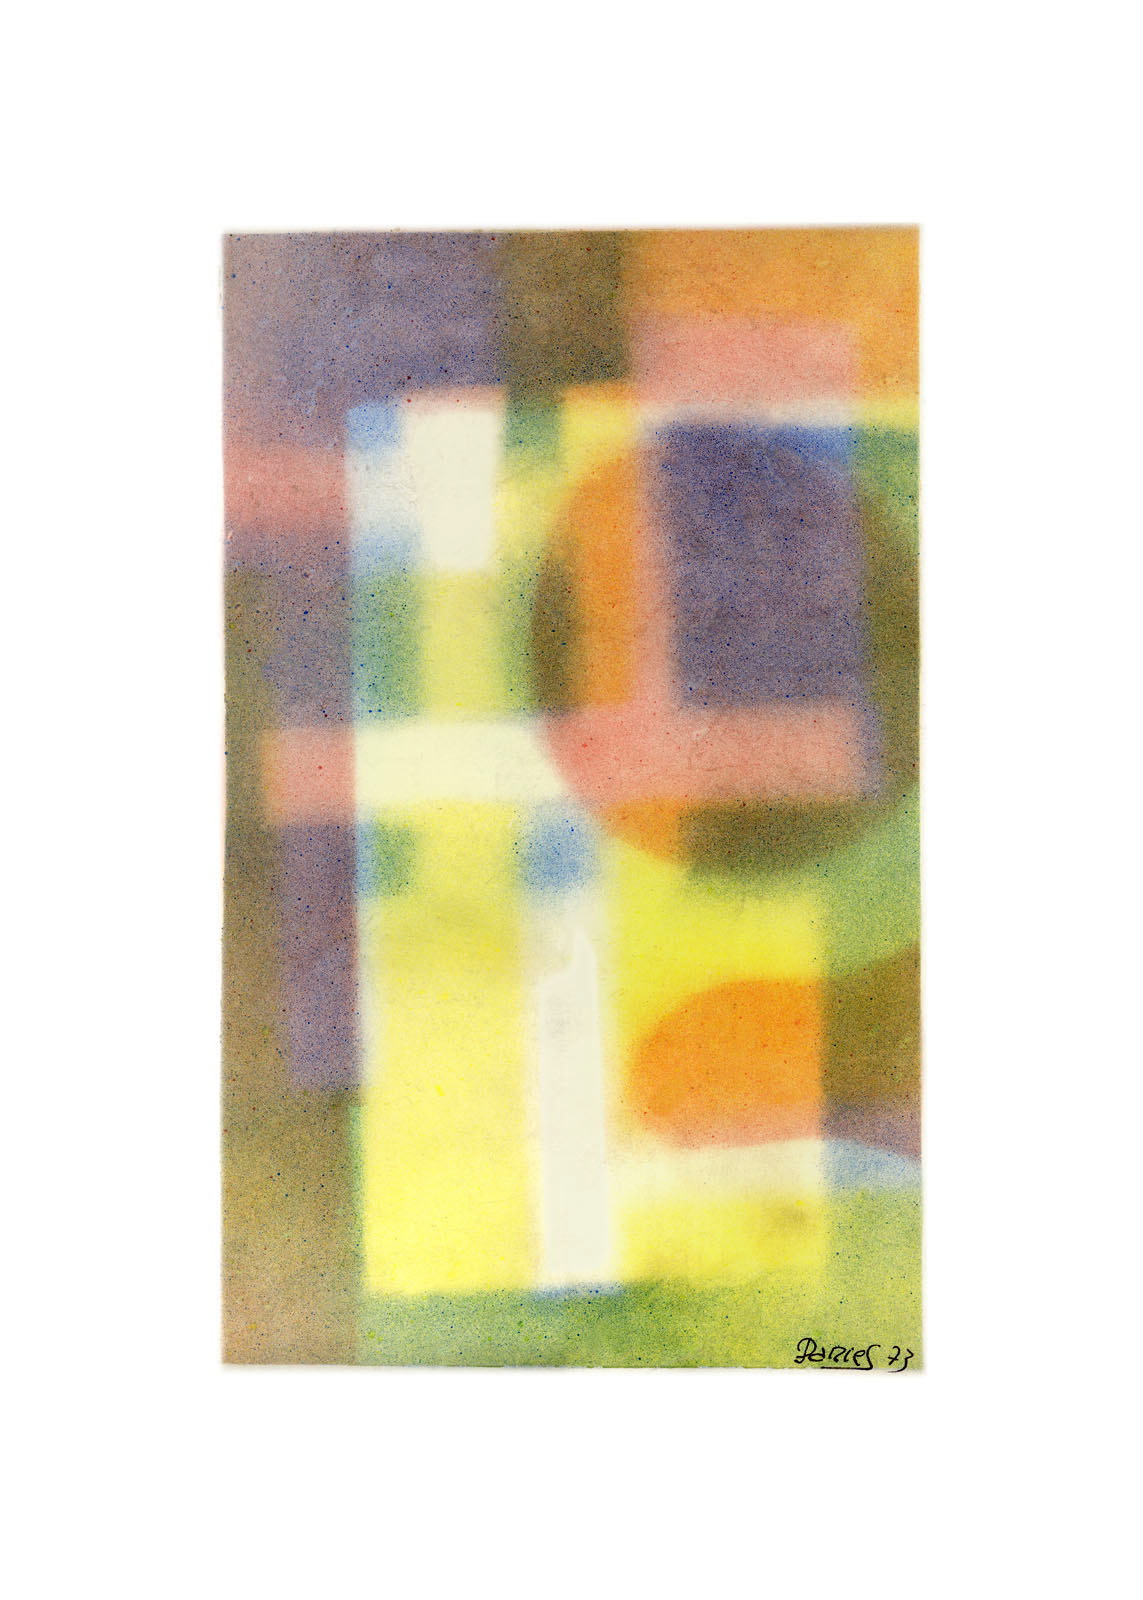 panies-danielvillalobos-spanish-painting-abstract-14